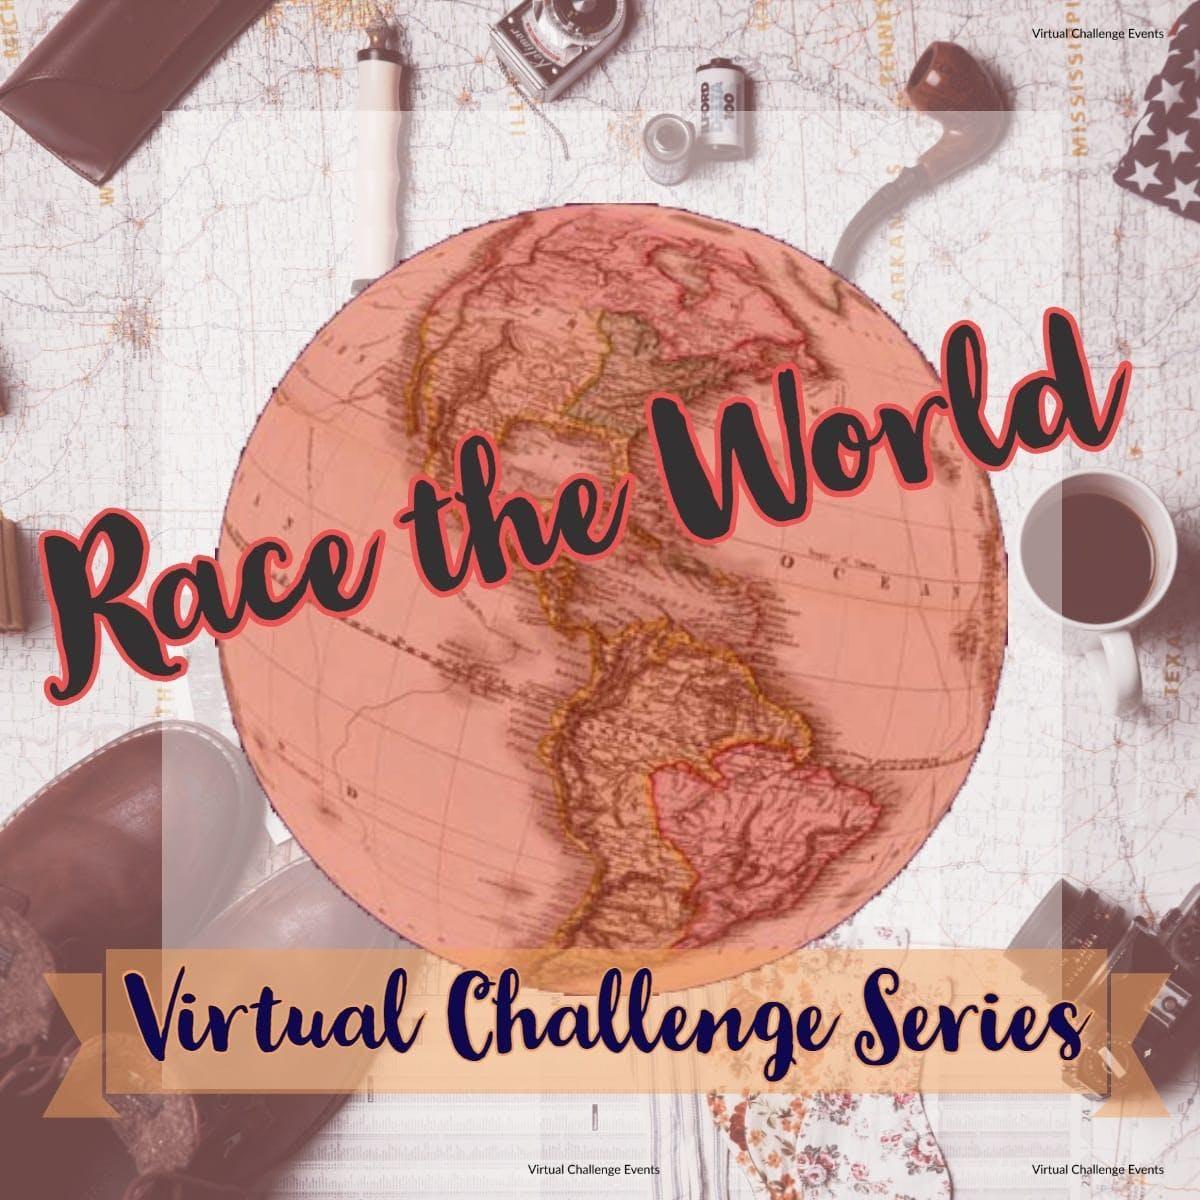 1000km challenge 2019